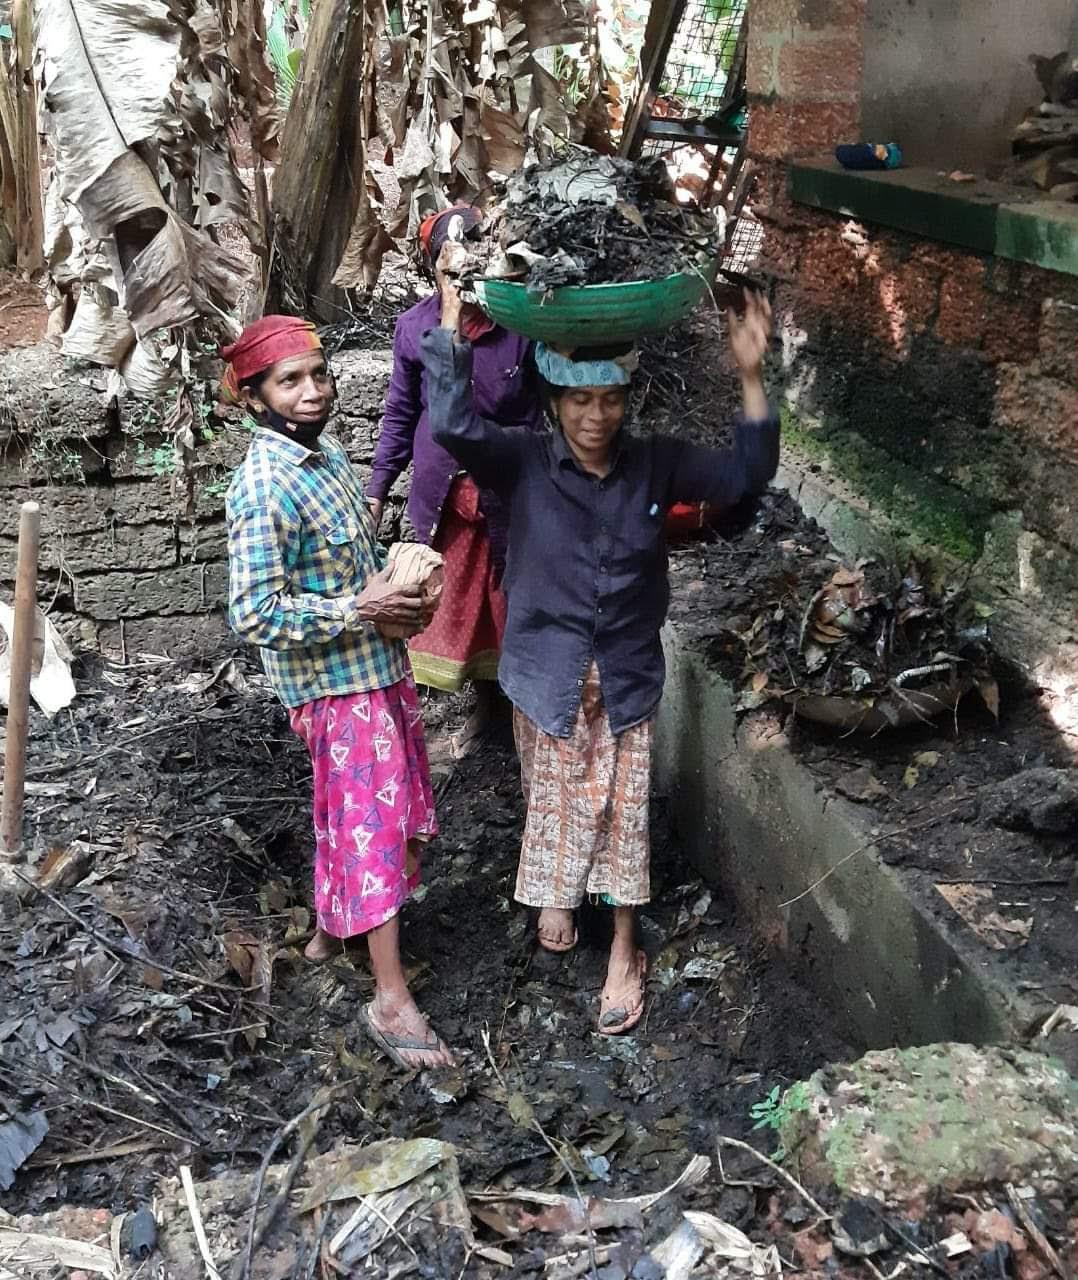 P. Prameela, who won a landslide at Pilicode, returns to work the next day